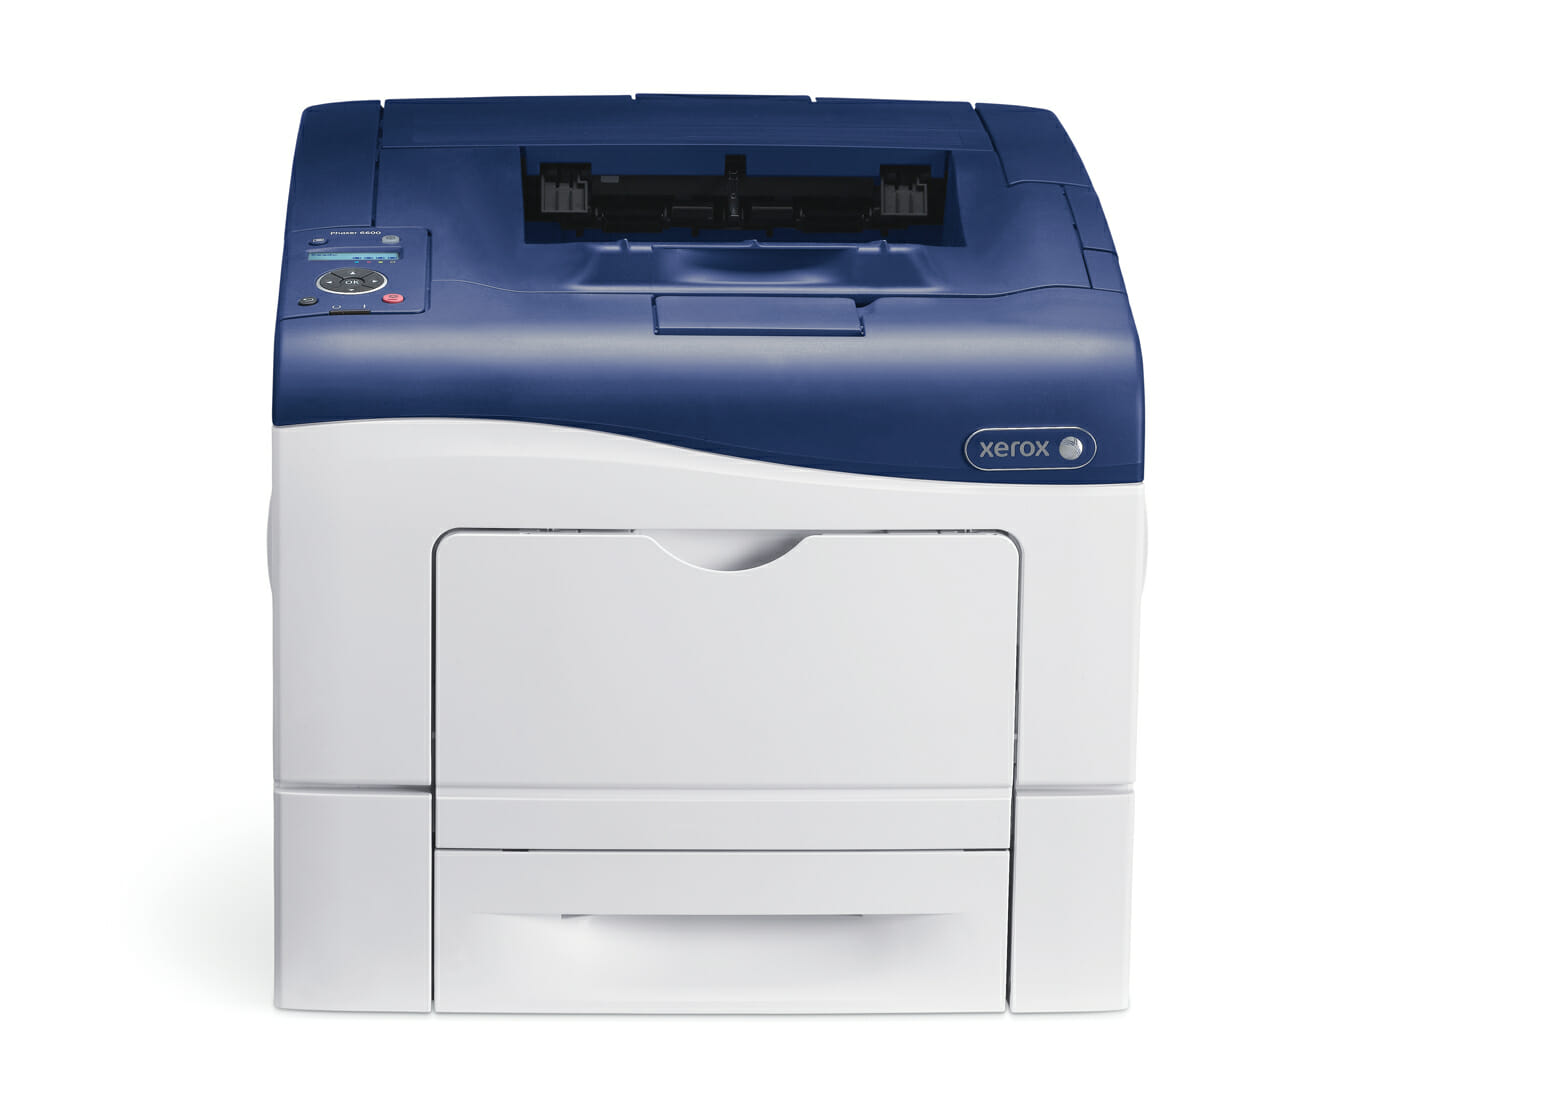 Xerox 6600